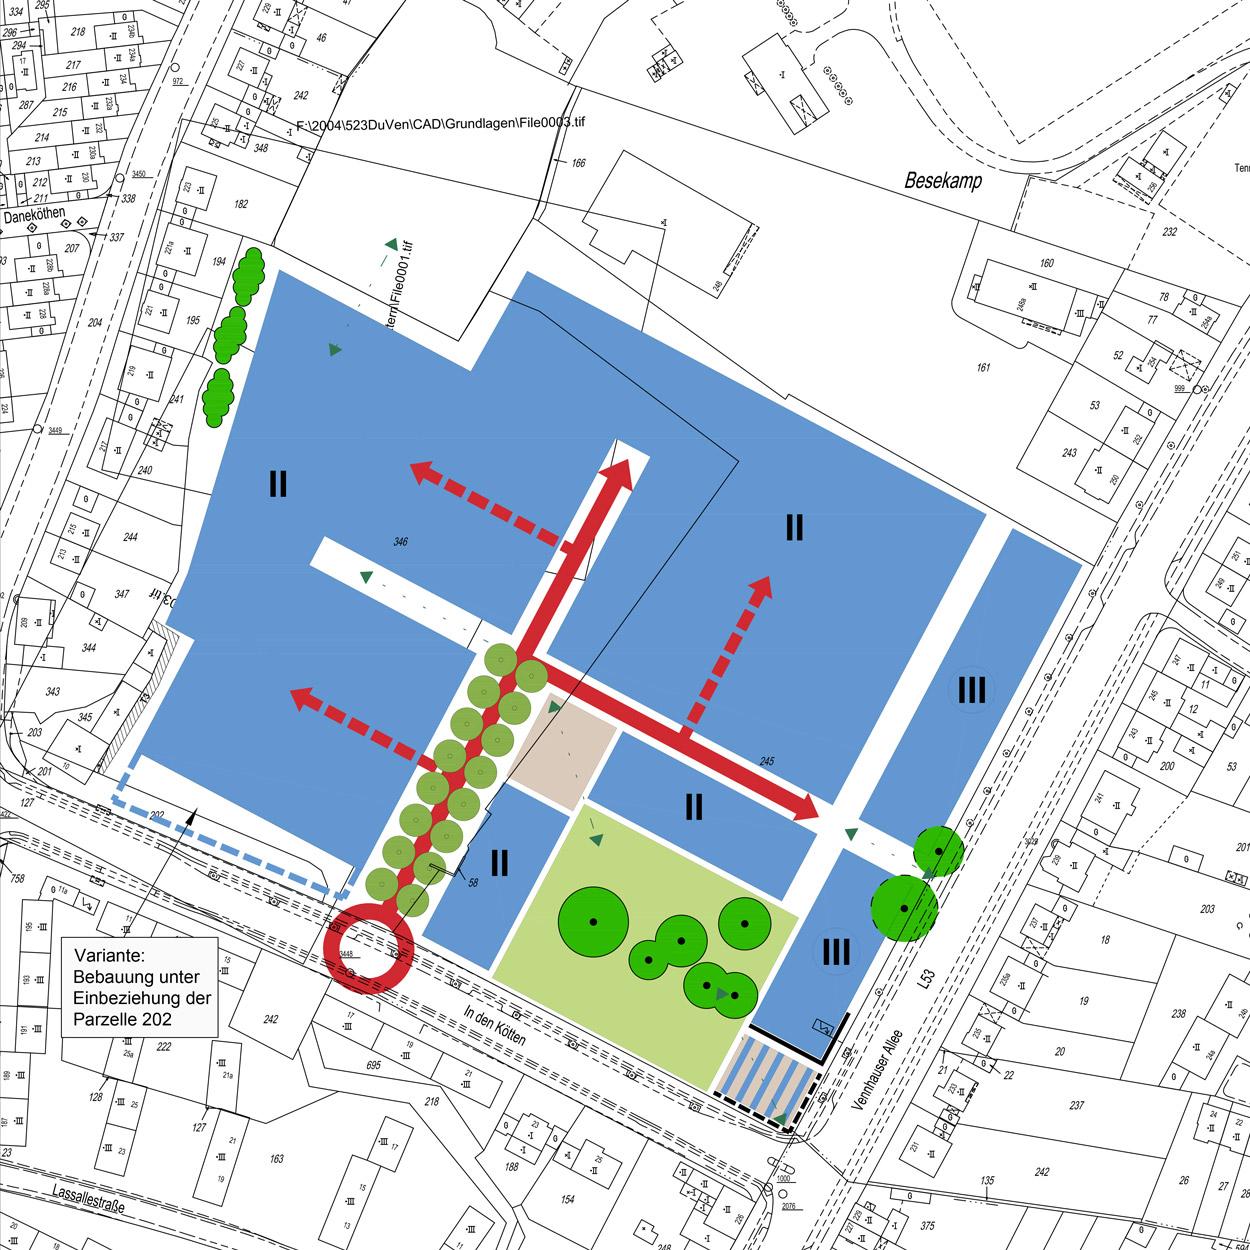 Rahmenplan Wohngebiet Veenpark Düsseldorf-Vennhausen Planquadrat Dortmund